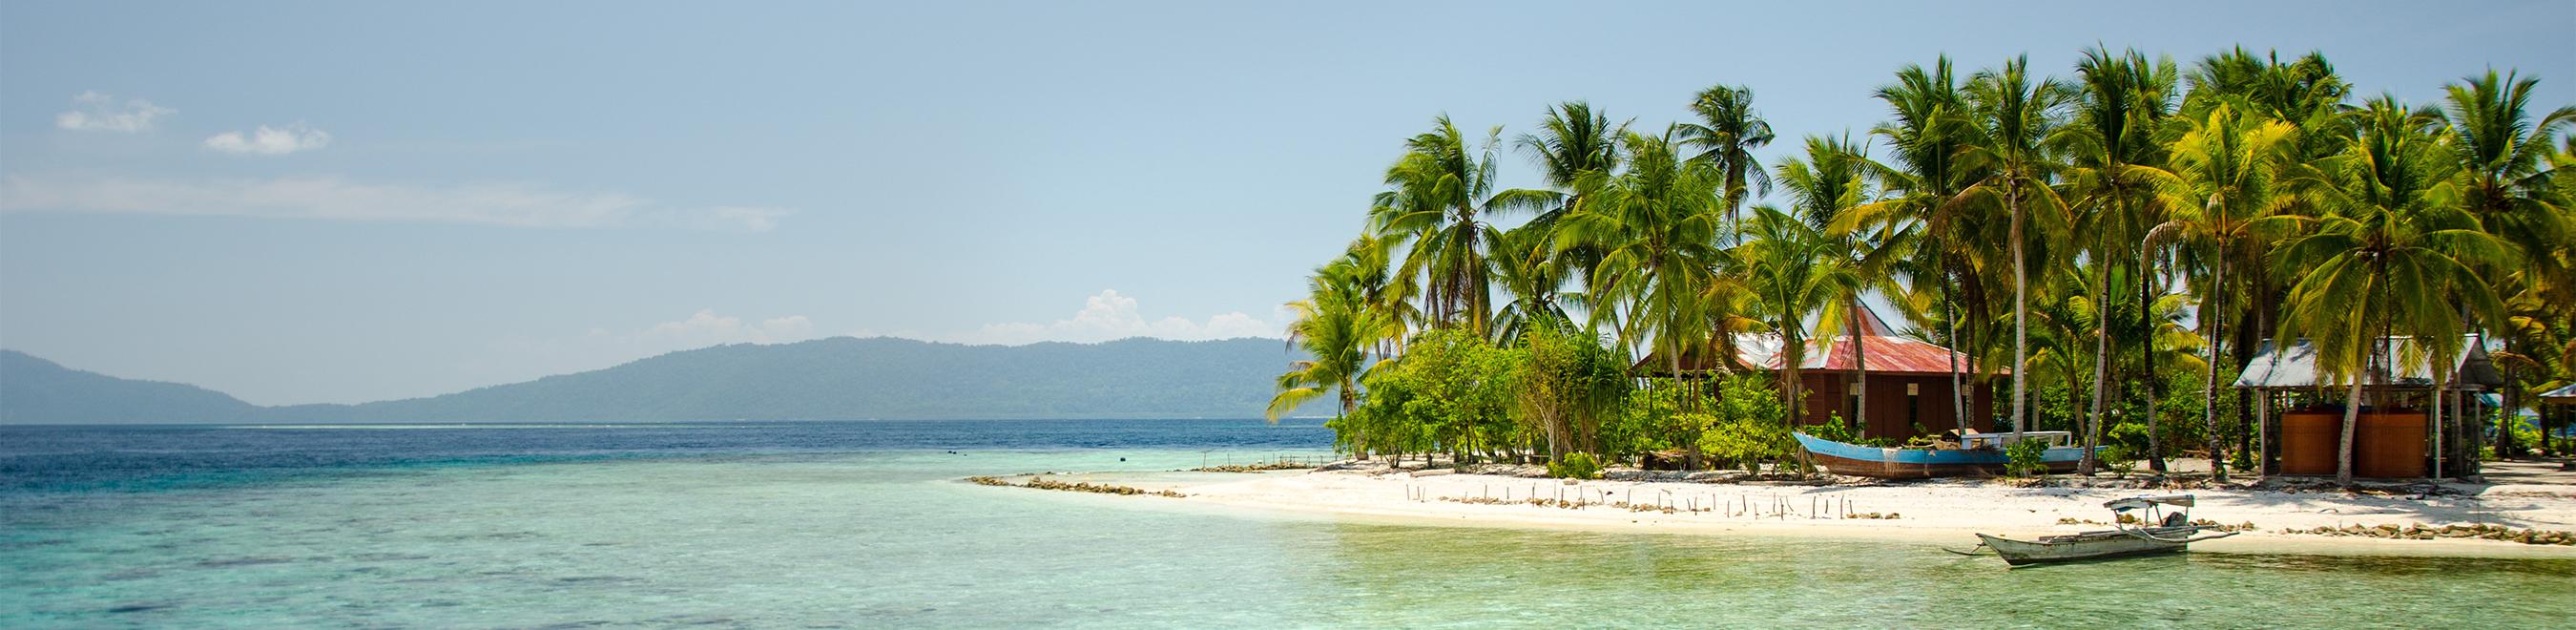 11 Pantai